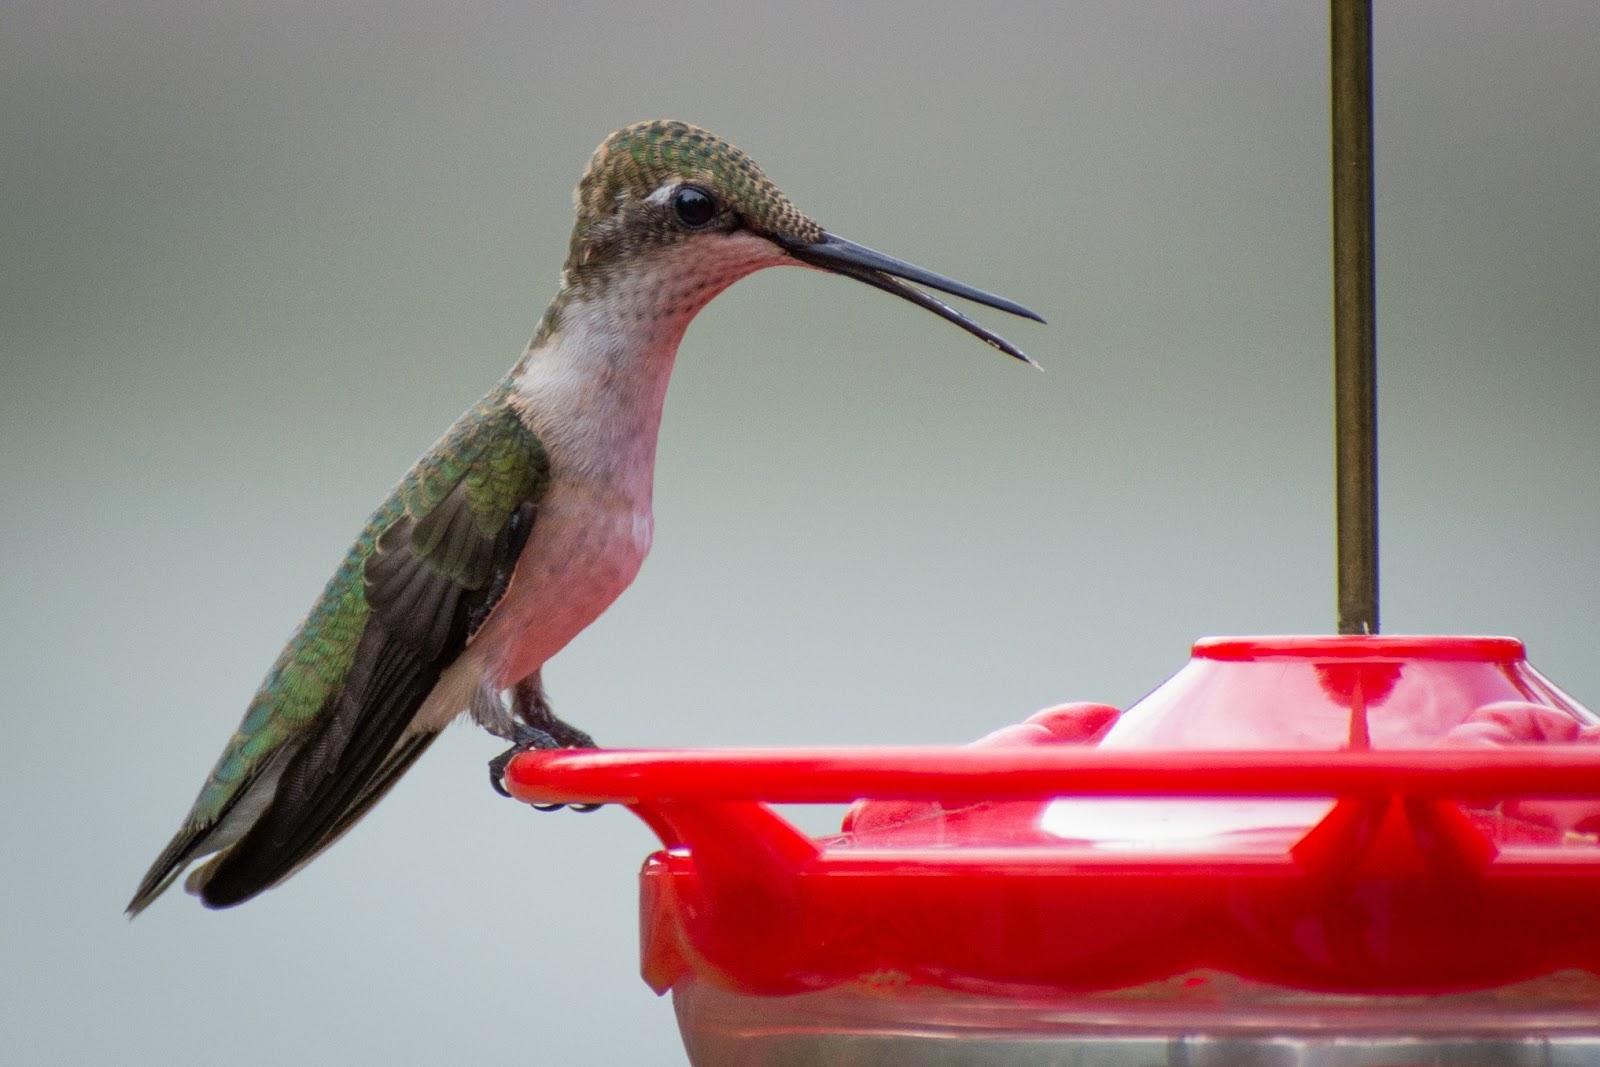 garden perky window feeders bird patio amazon birdscapes birds unlimited pet ca clear feeder dp wild lawn